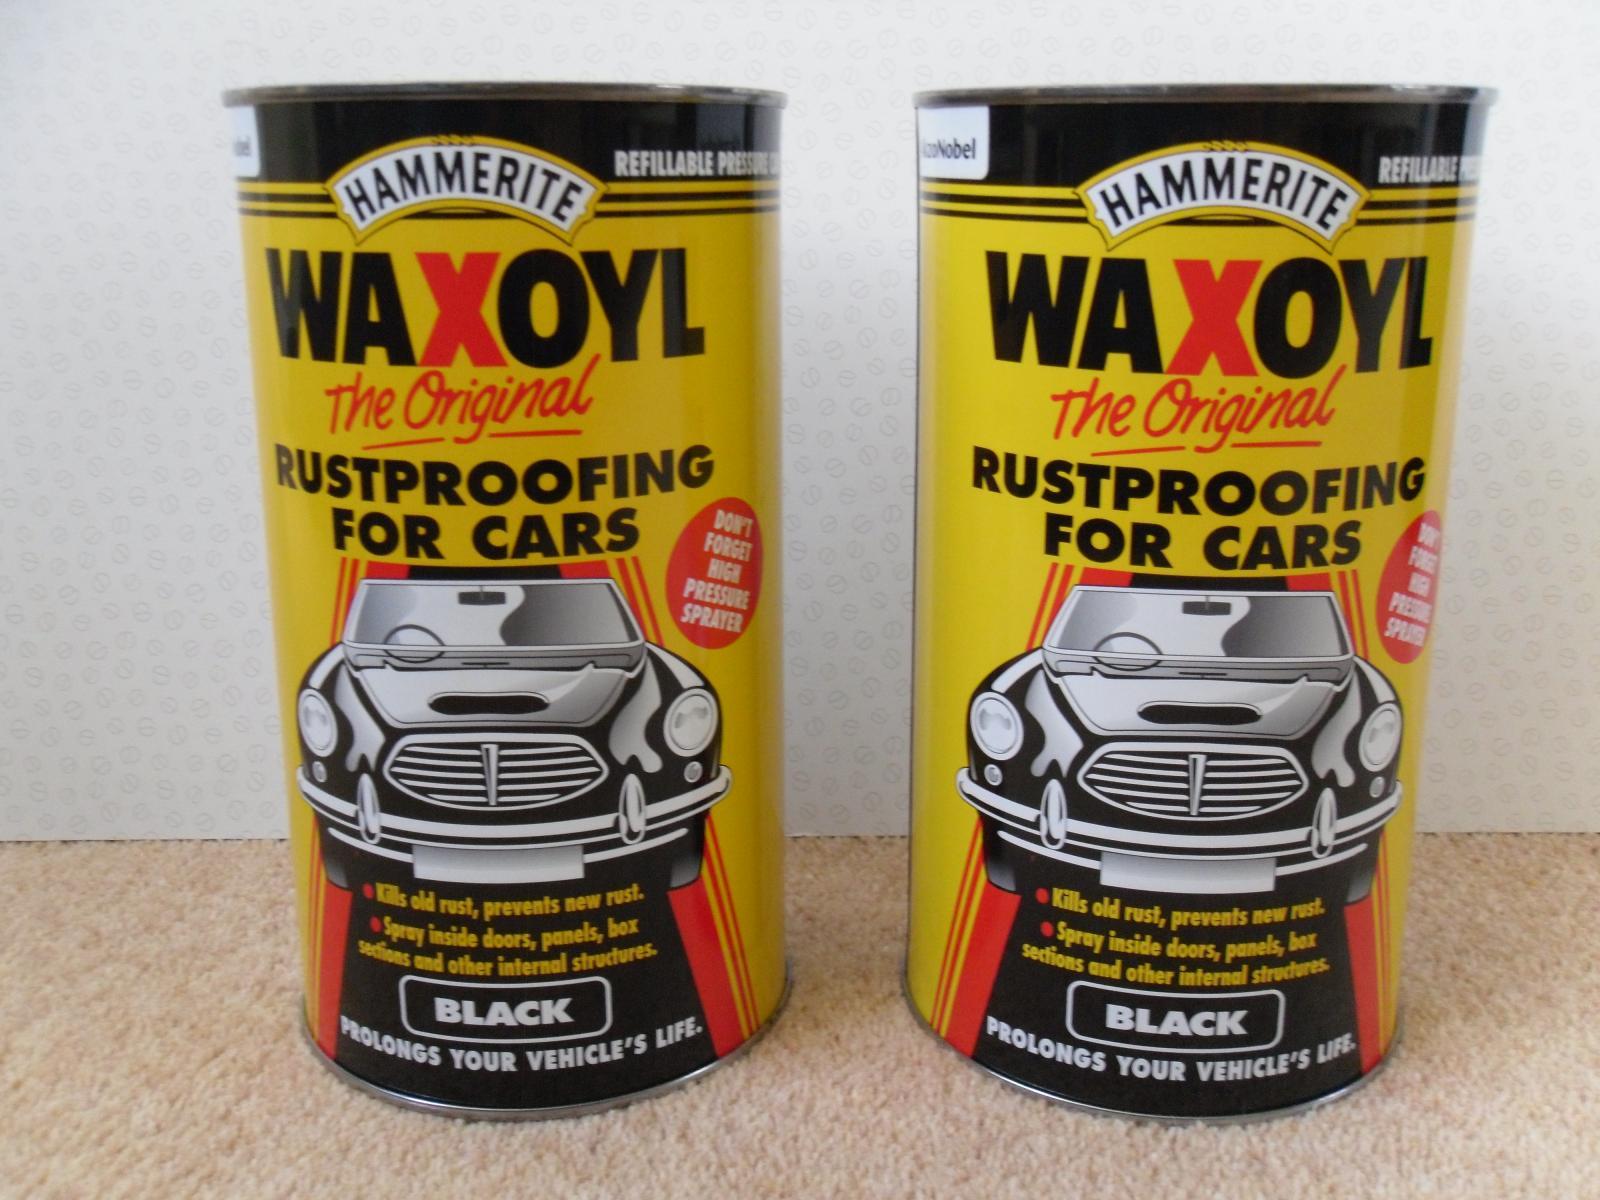 Waxoyl 002.JPG